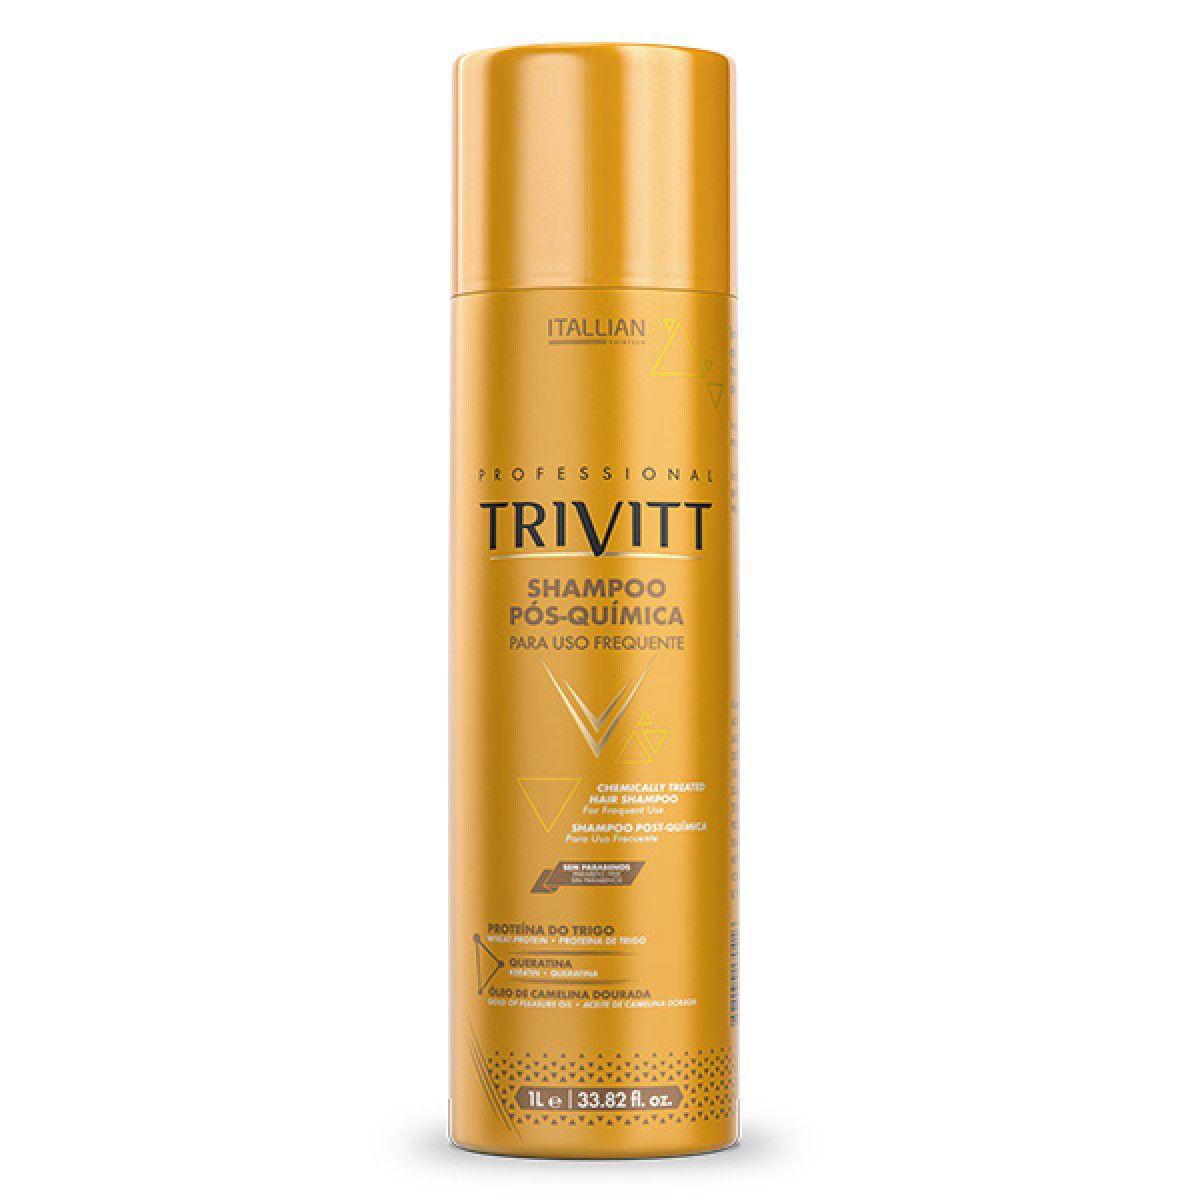 Shampoo Trivitt Profissional + Condicionador Clinic Repair Richée